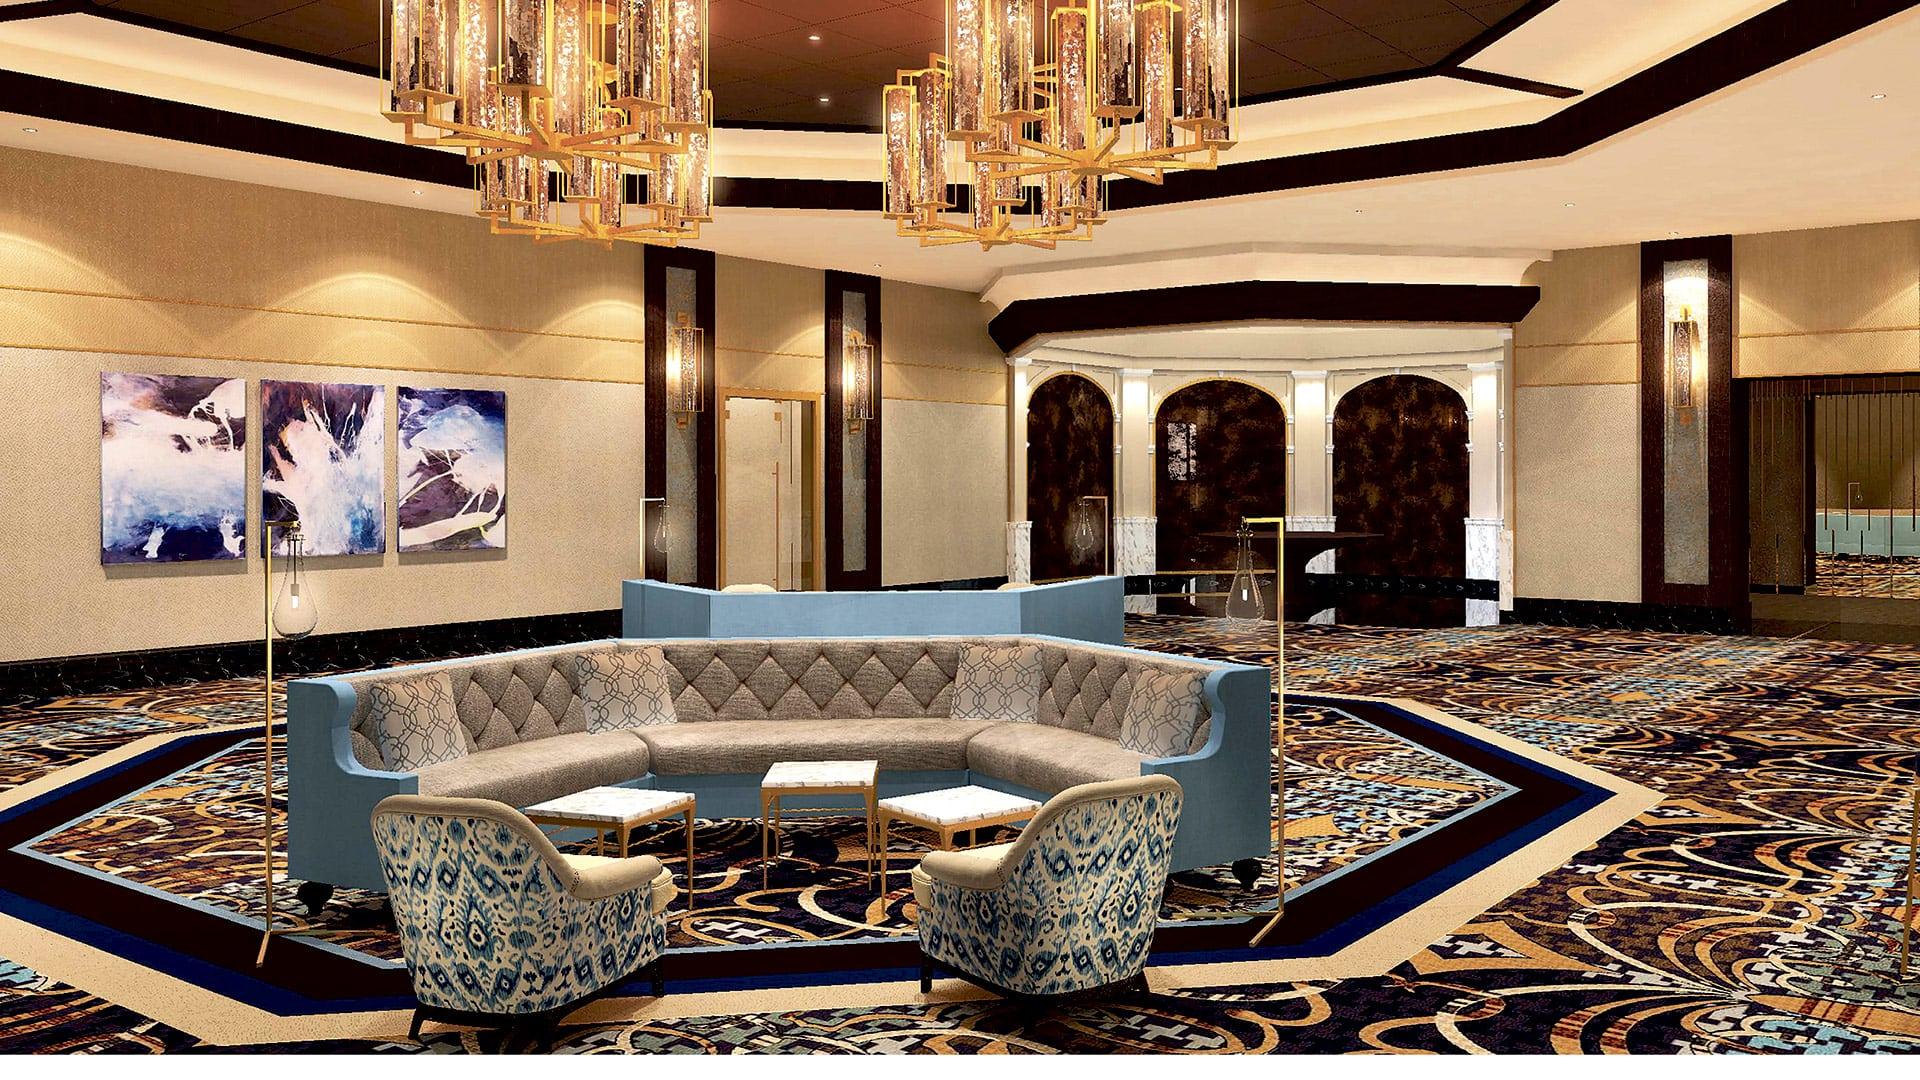 katie malik interior designer cambridge massachusetts